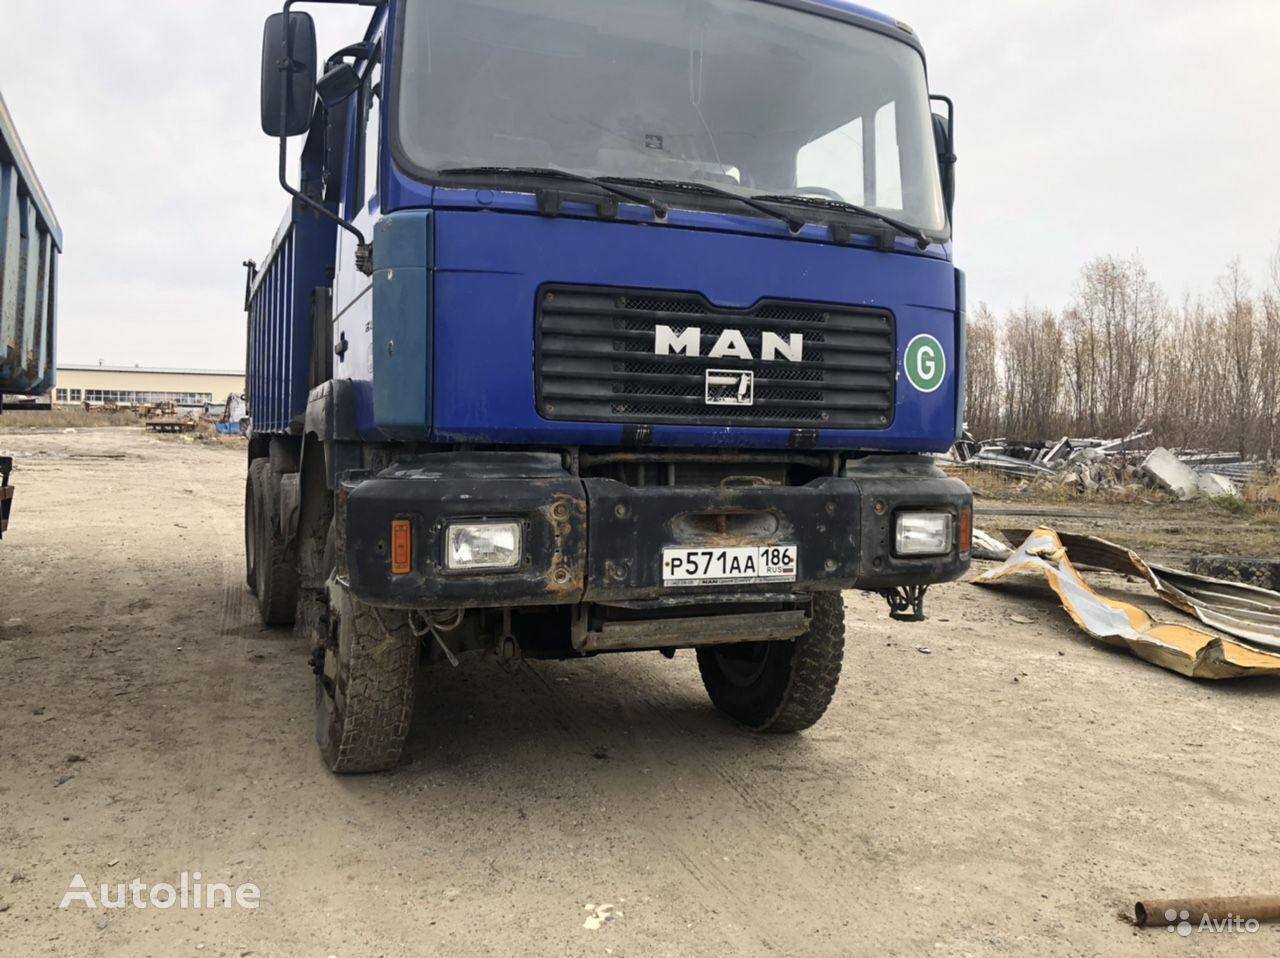 MAN F2000 41.414 REZERVES DETAĻĀS dump truck for parts